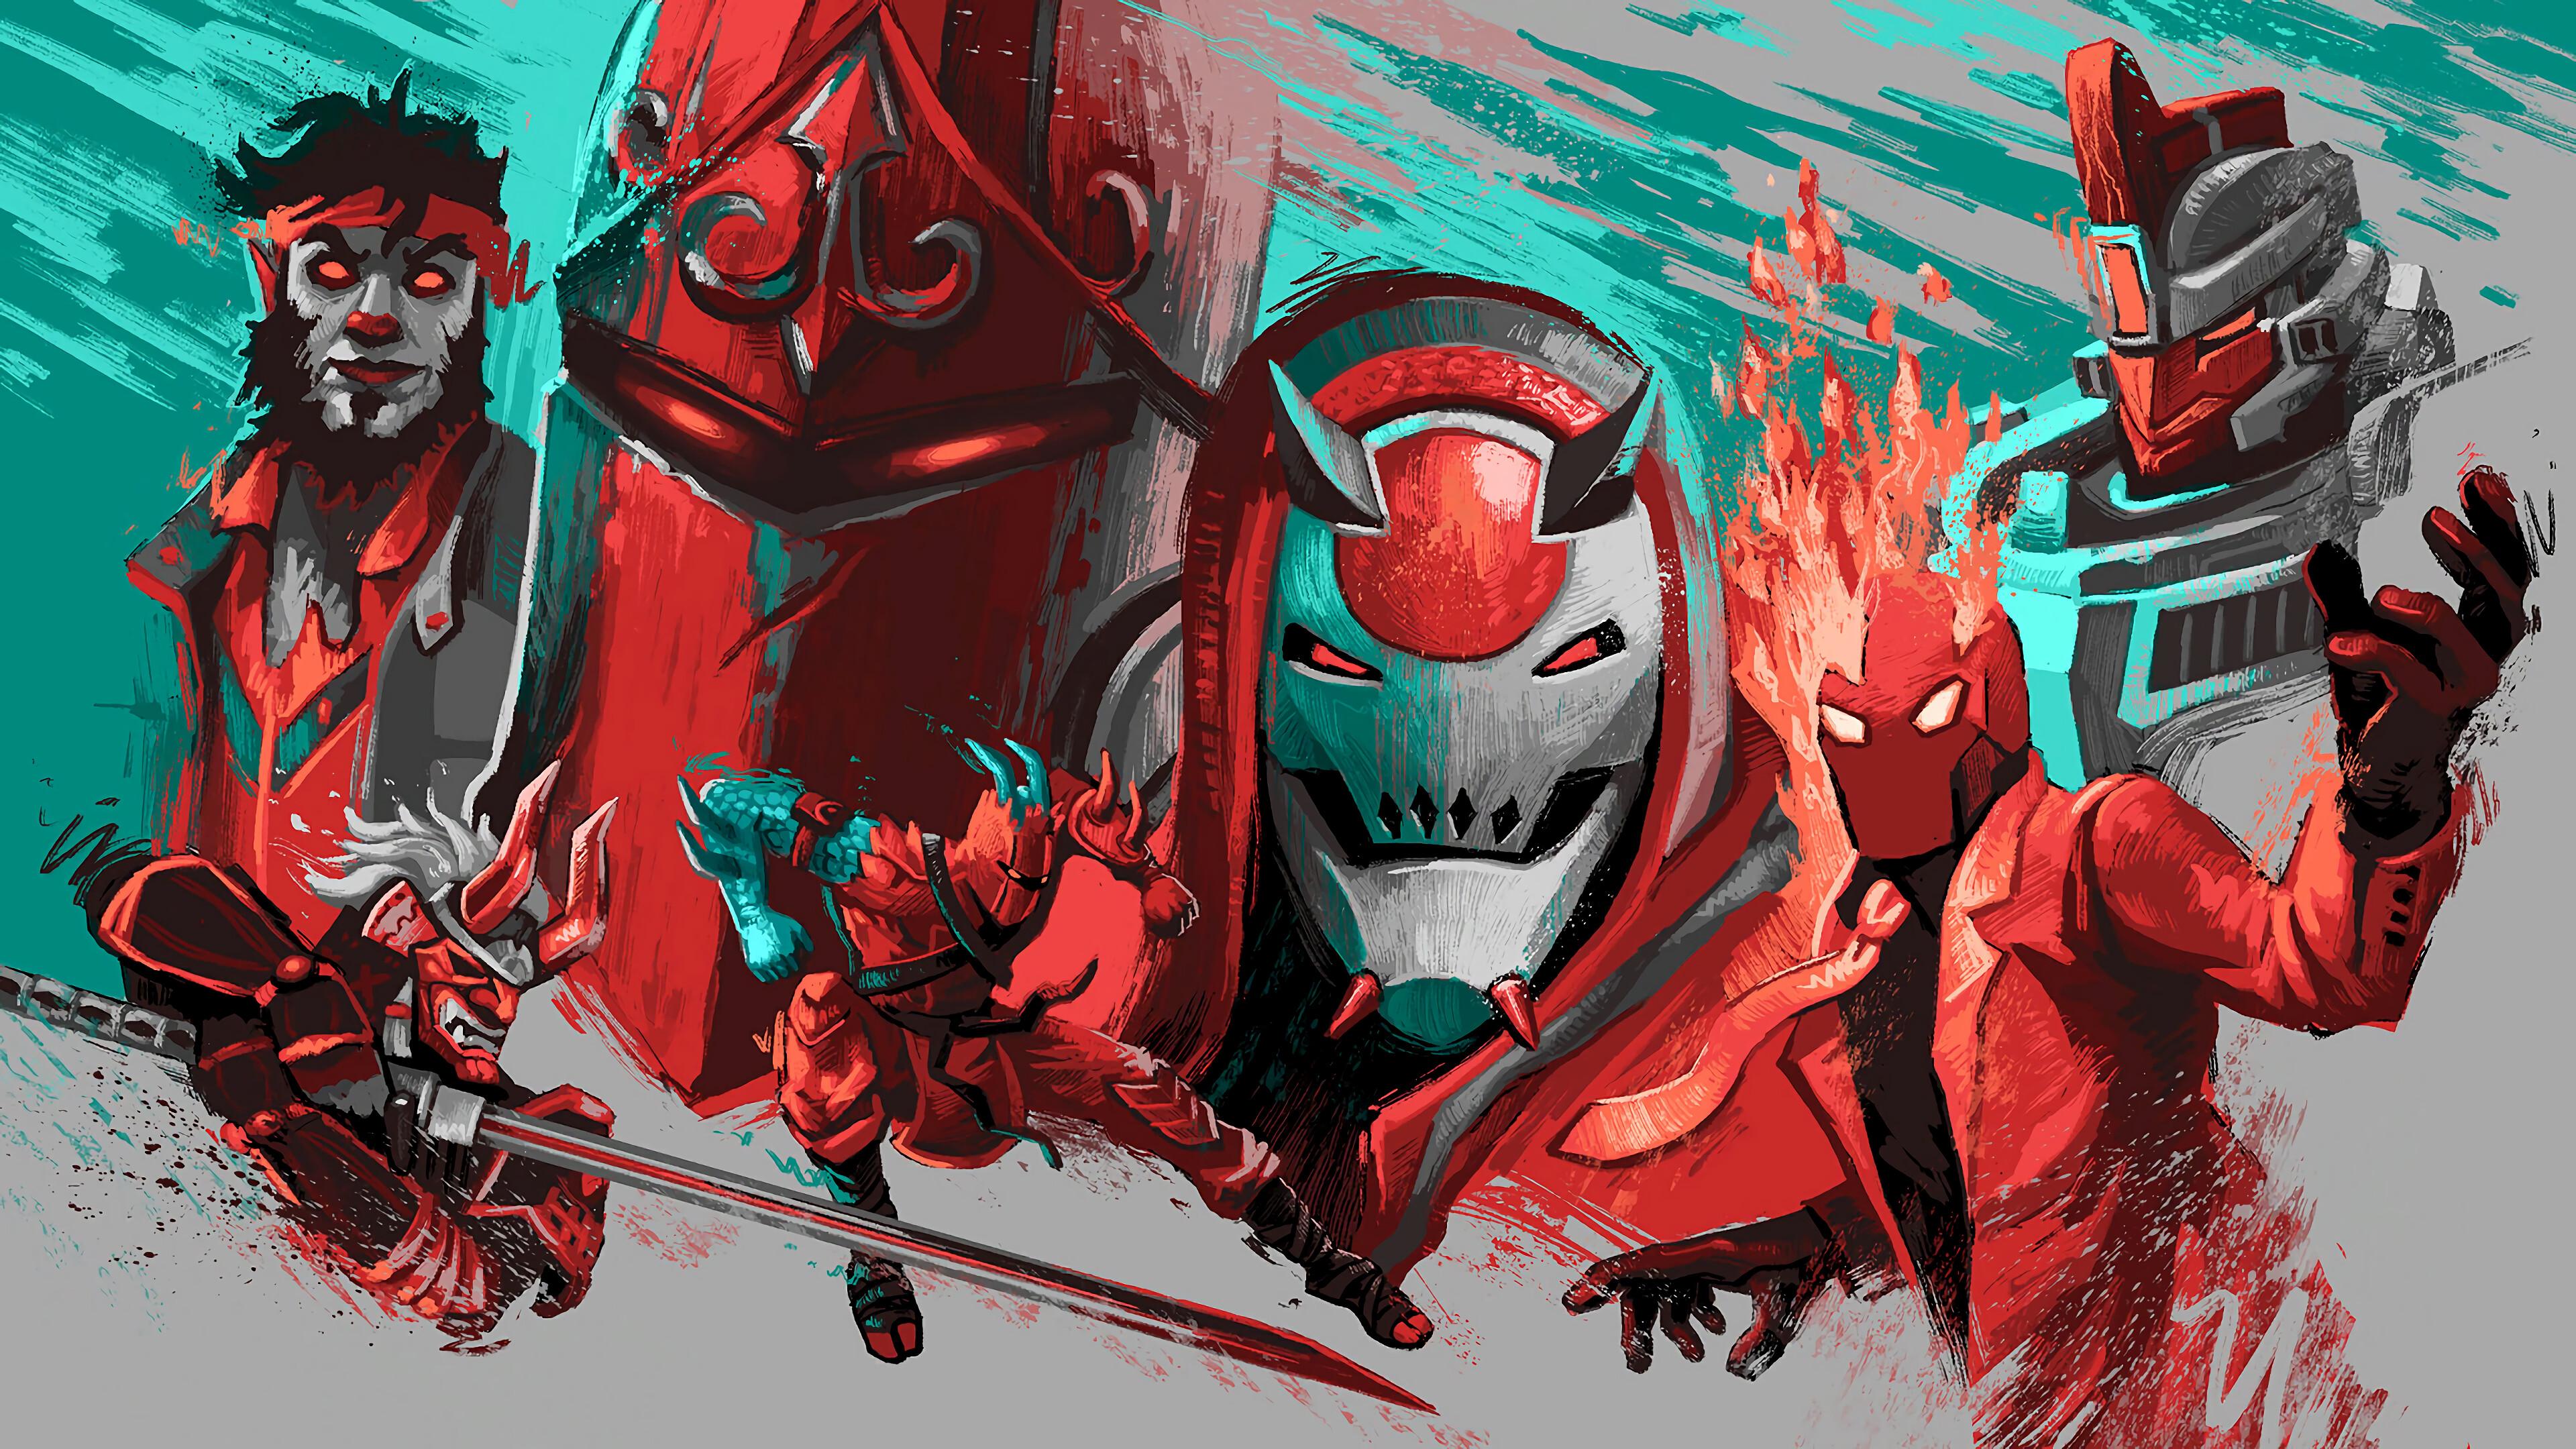 Fortnite Red Knight Vendetta Hybrid Shogun Dire InfernoSentinel 4K 3840x2160